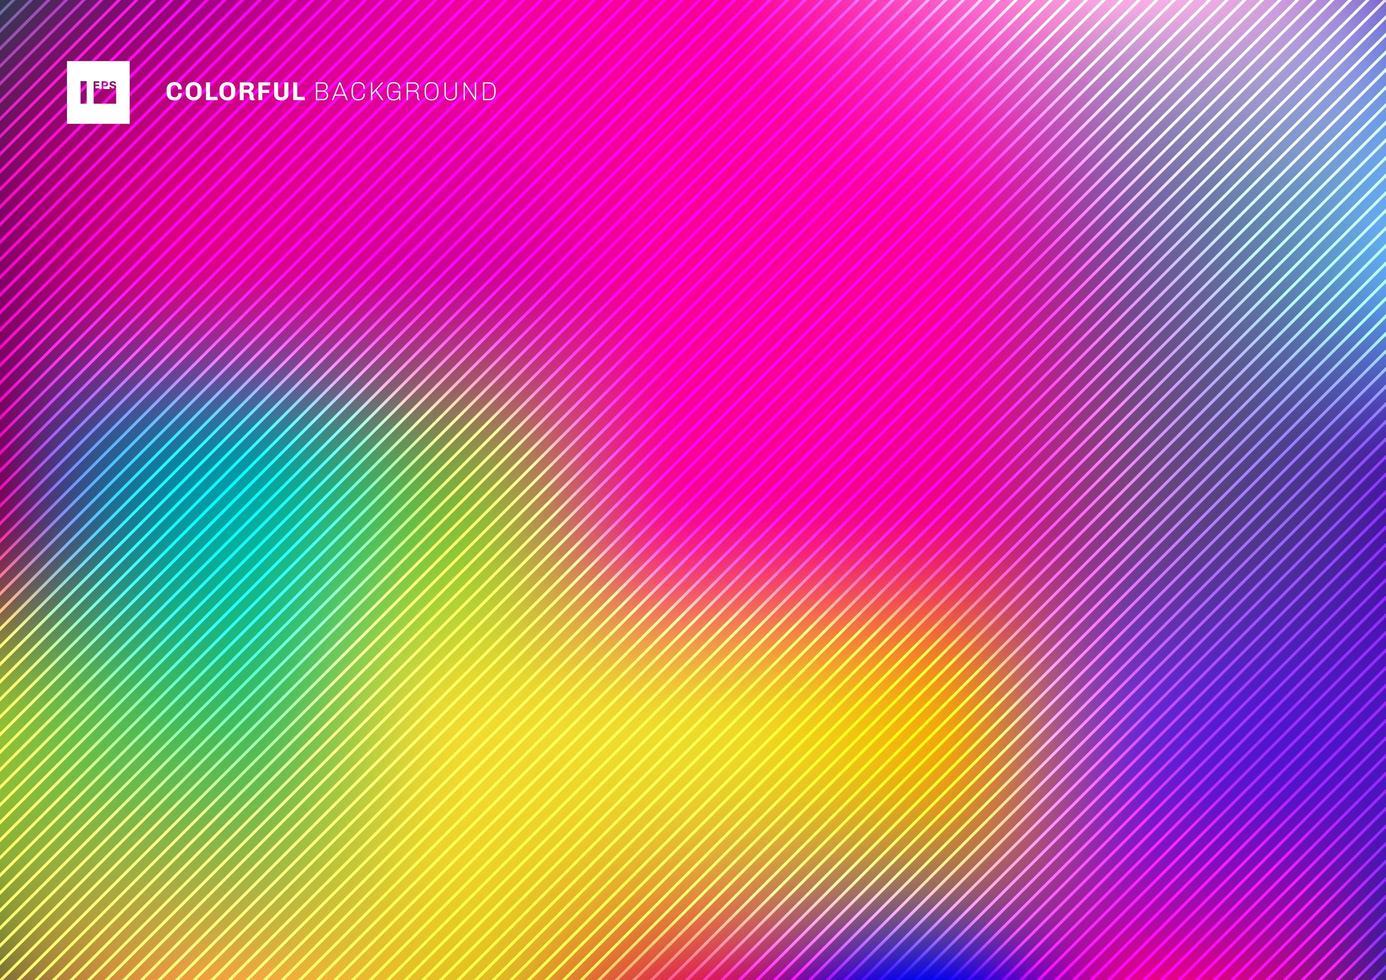 abstrato turva fundo bonito colorido com textura de linhas diagonais. vetor